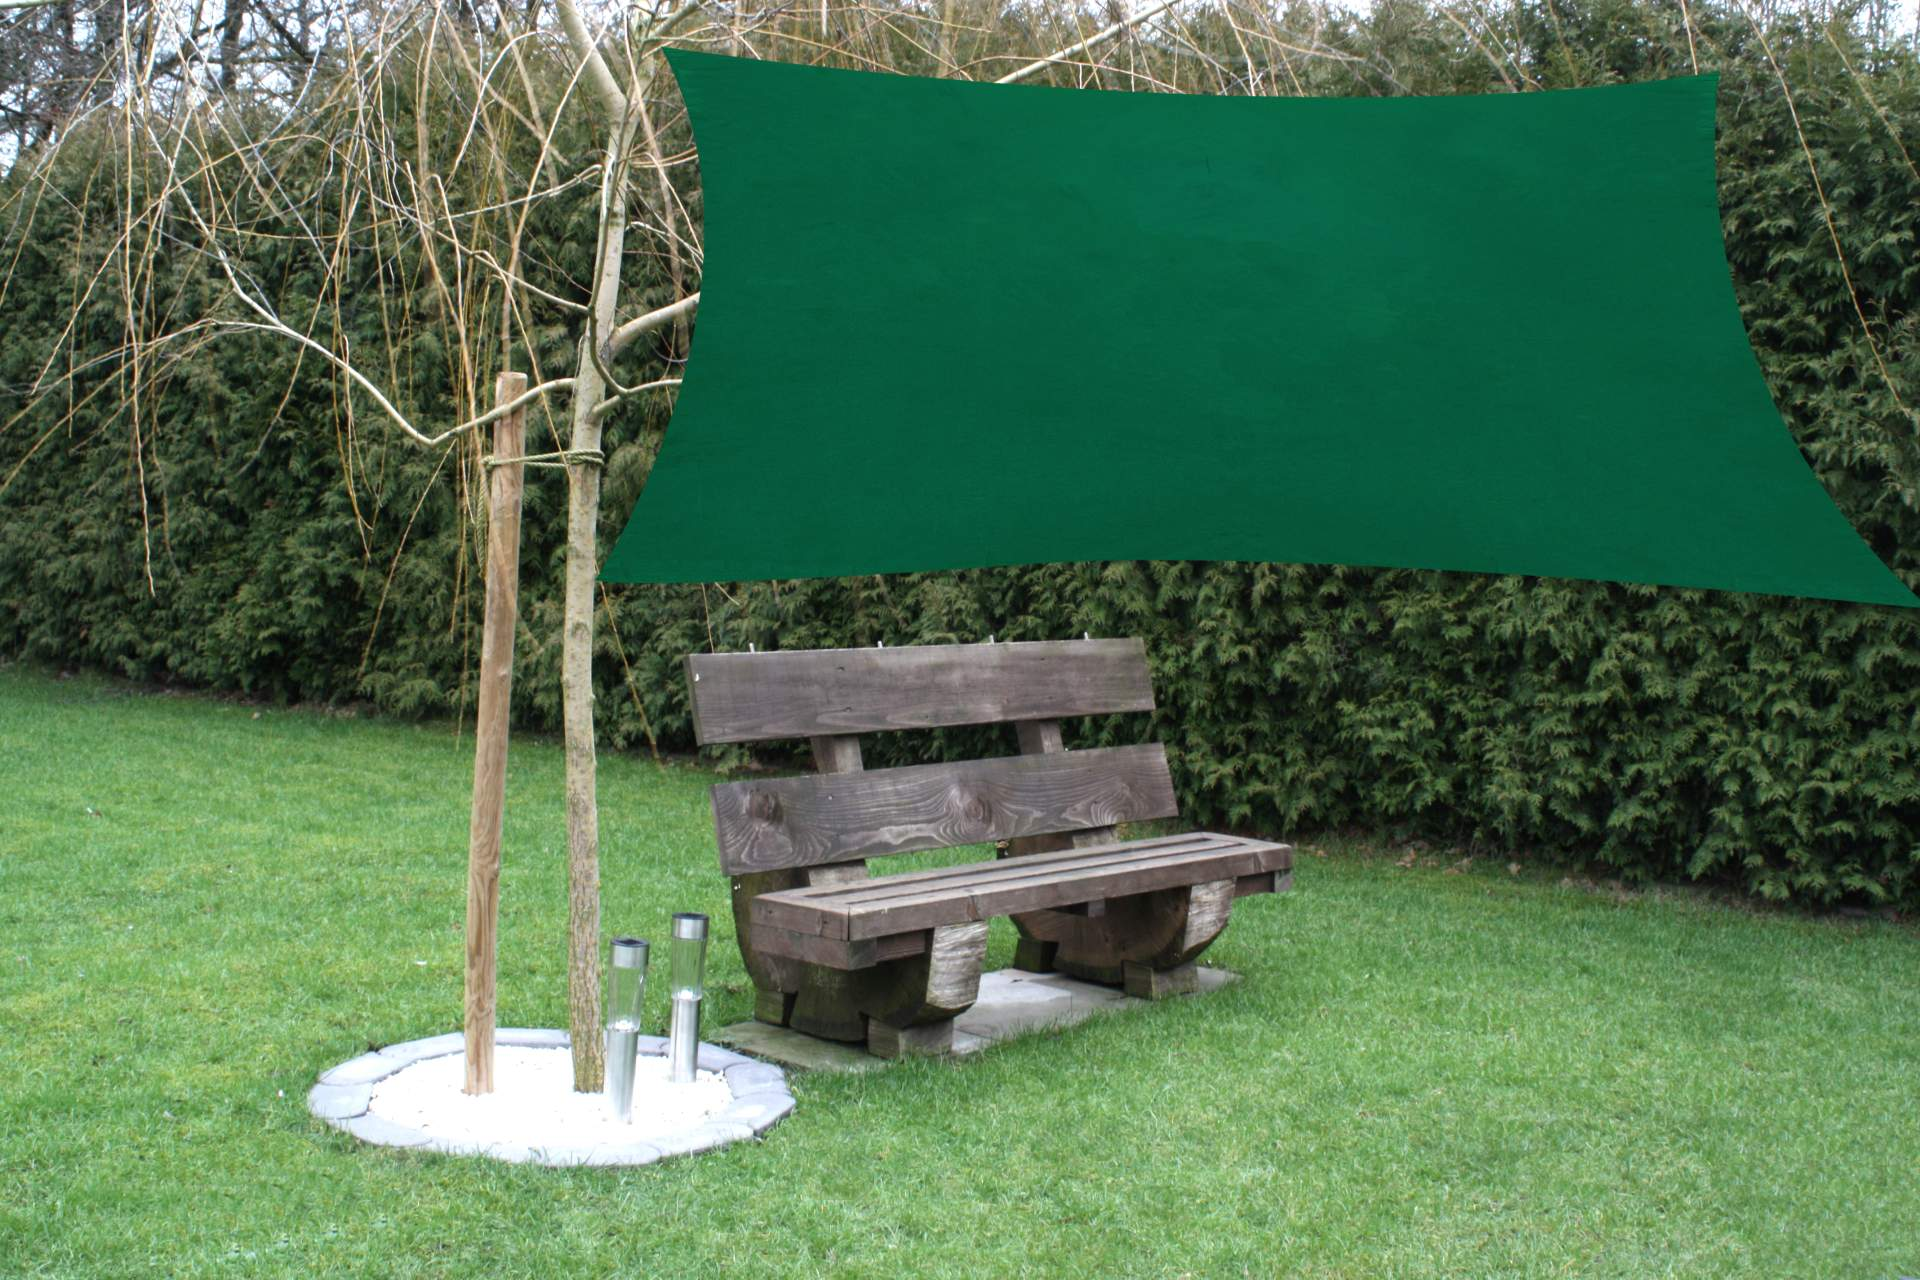 sonnensegel gr n quadratisch 3 6 x 3 6 m sonnendach. Black Bedroom Furniture Sets. Home Design Ideas